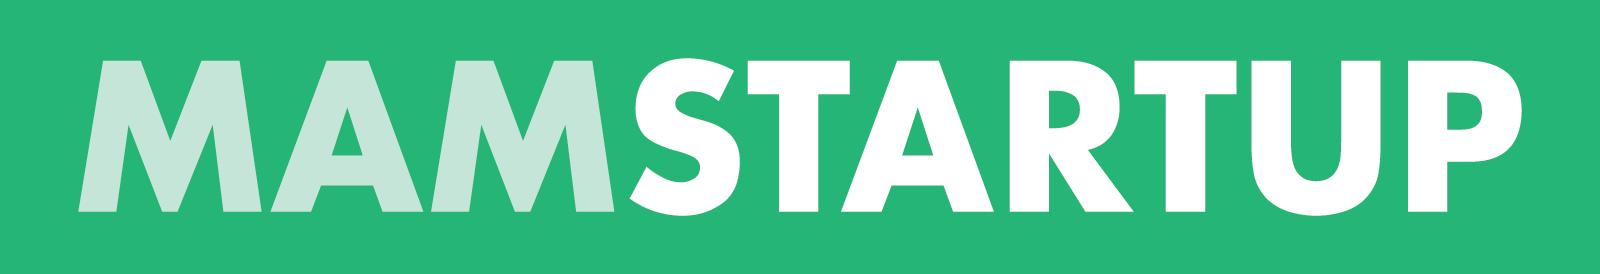 Mam-Startup-logo.png